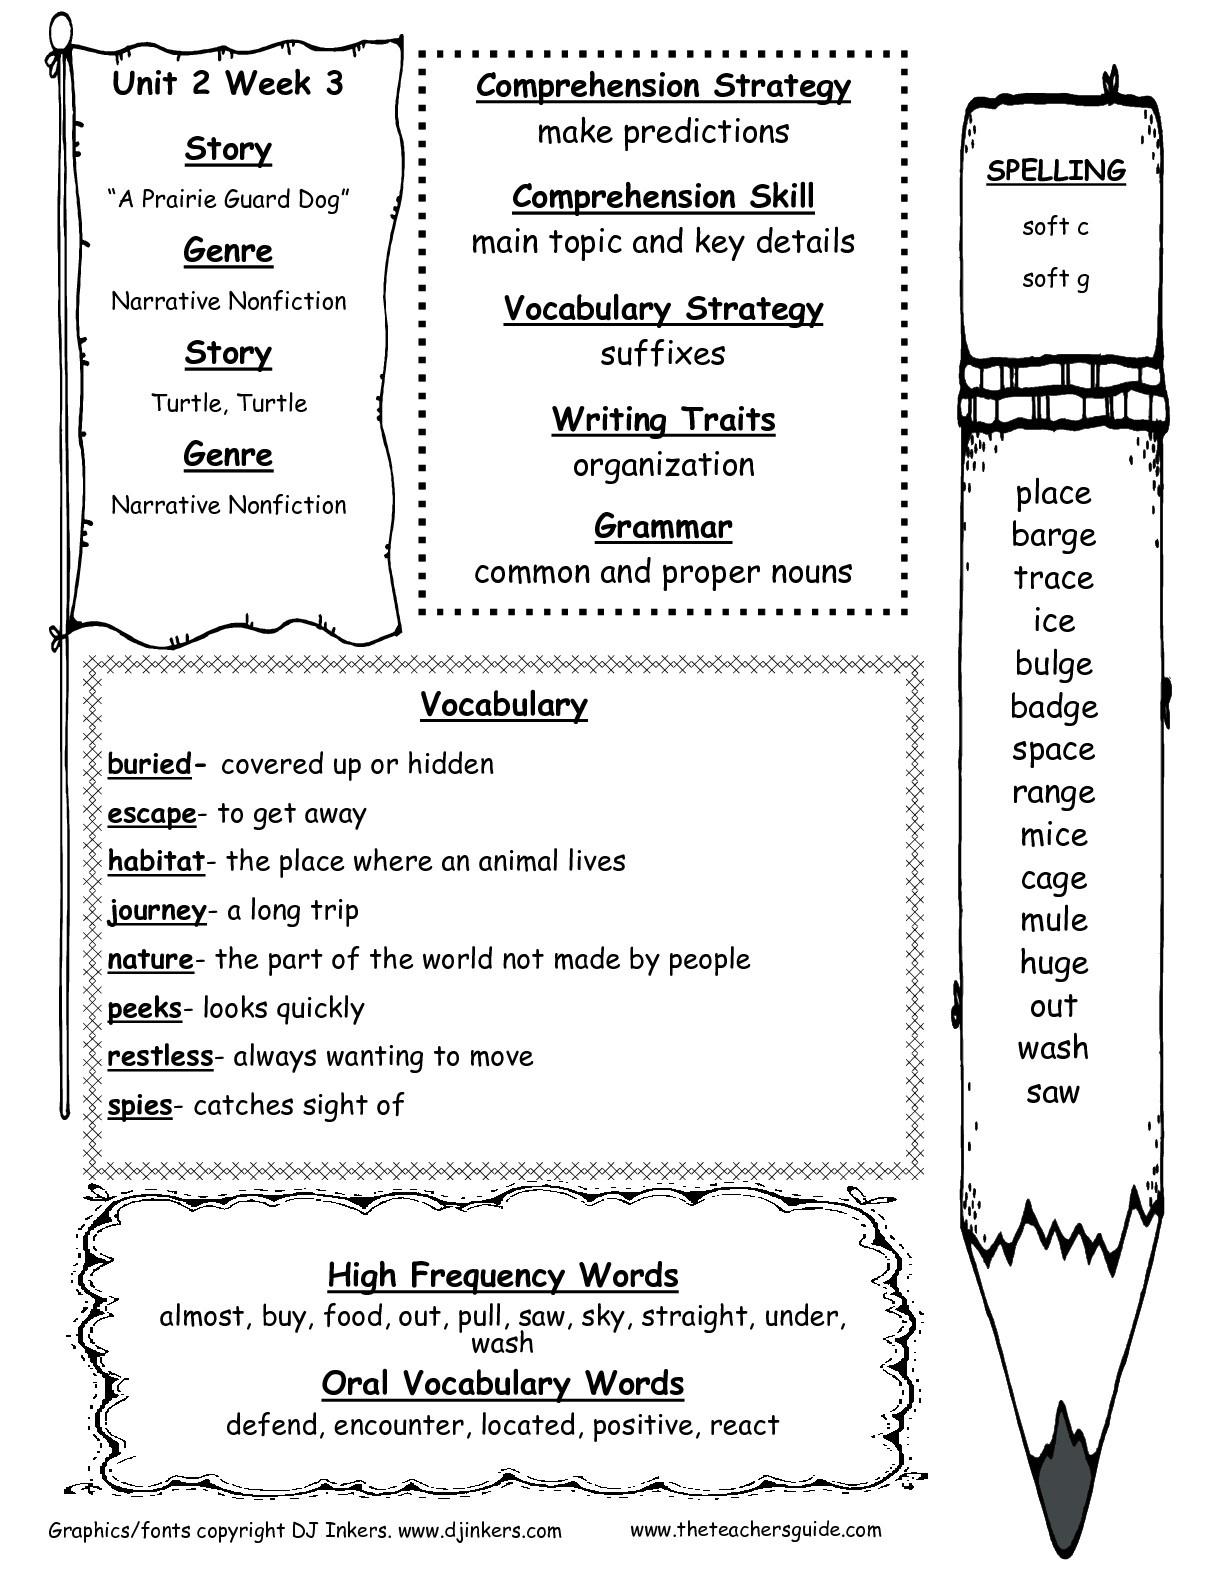 Free Printable Worksheets For 2nd Grade Social Stu S